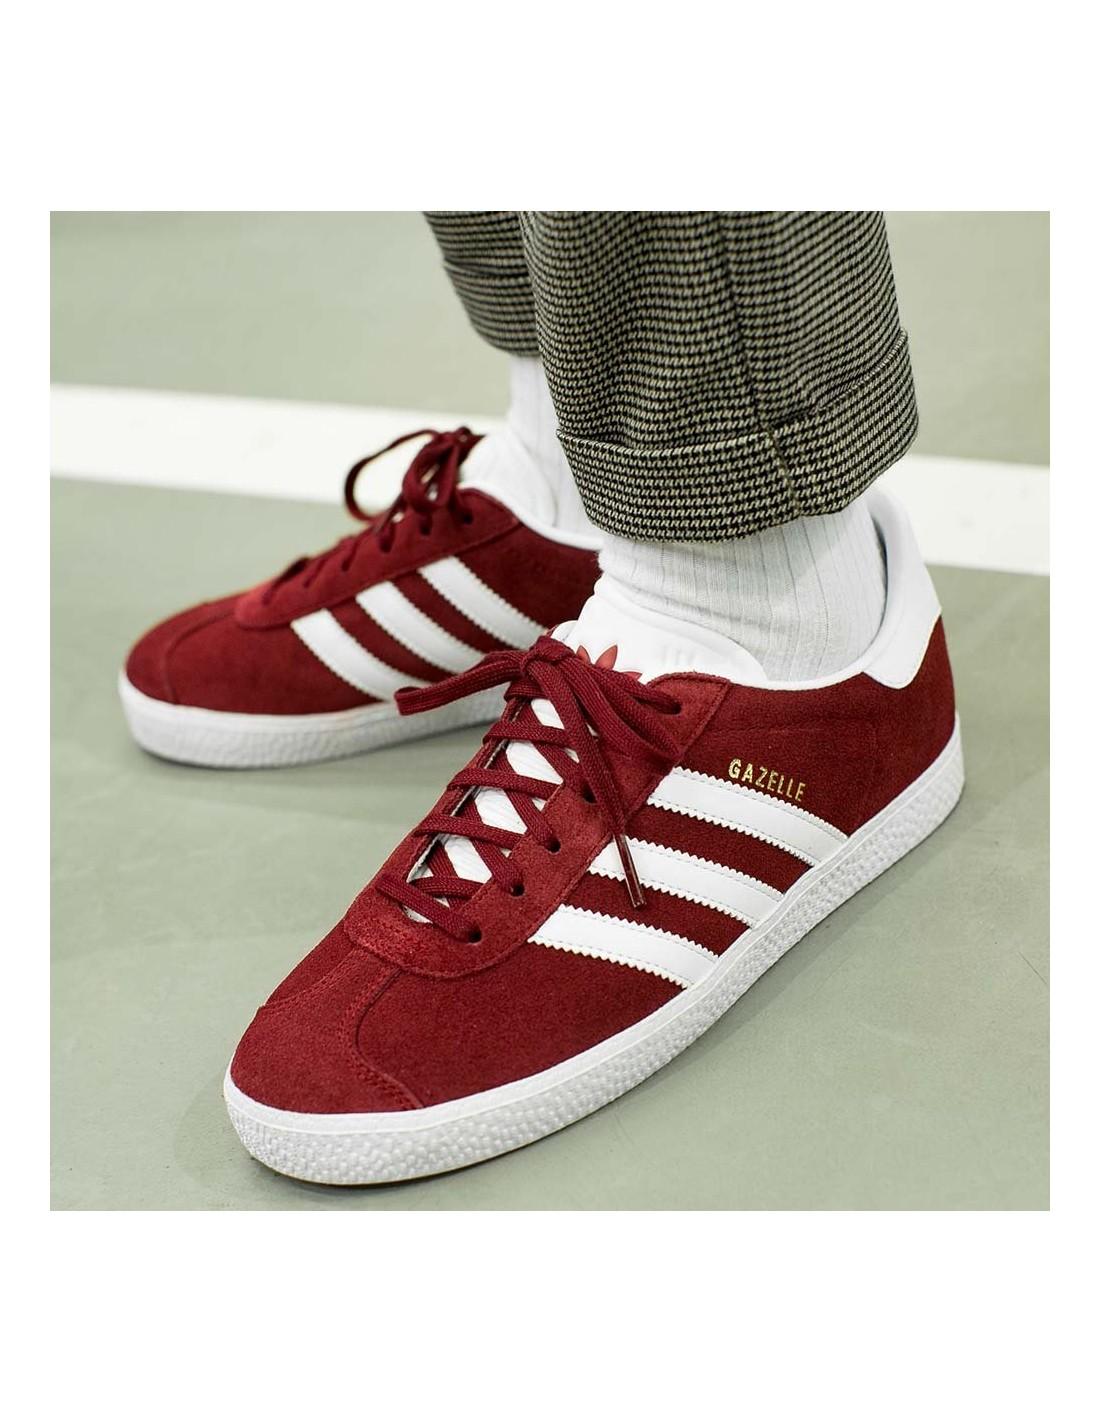 promo code 8ce45 883c8 ... Adidas Originals Gazelle Core Black BB2502 ...